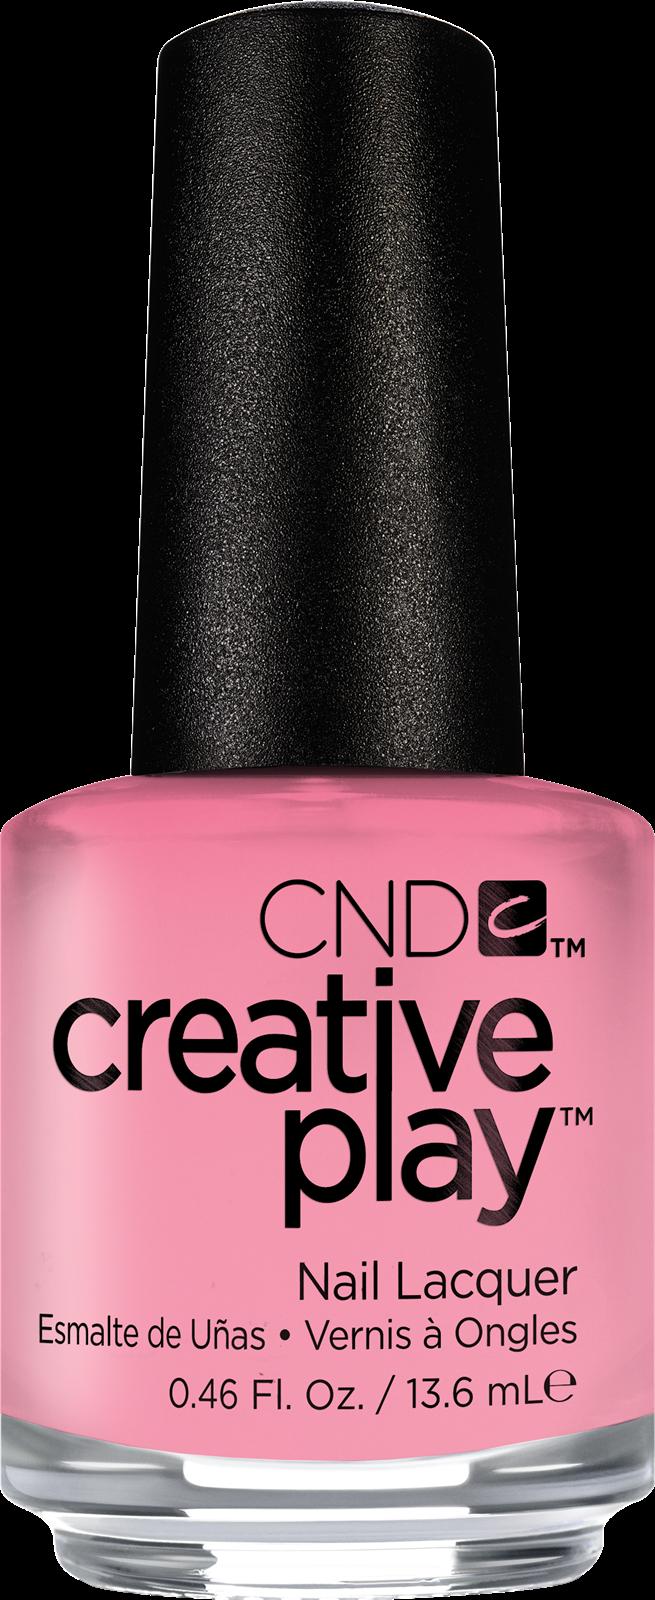 Afbeelding van CND ™ Creative Play Bubba Glam